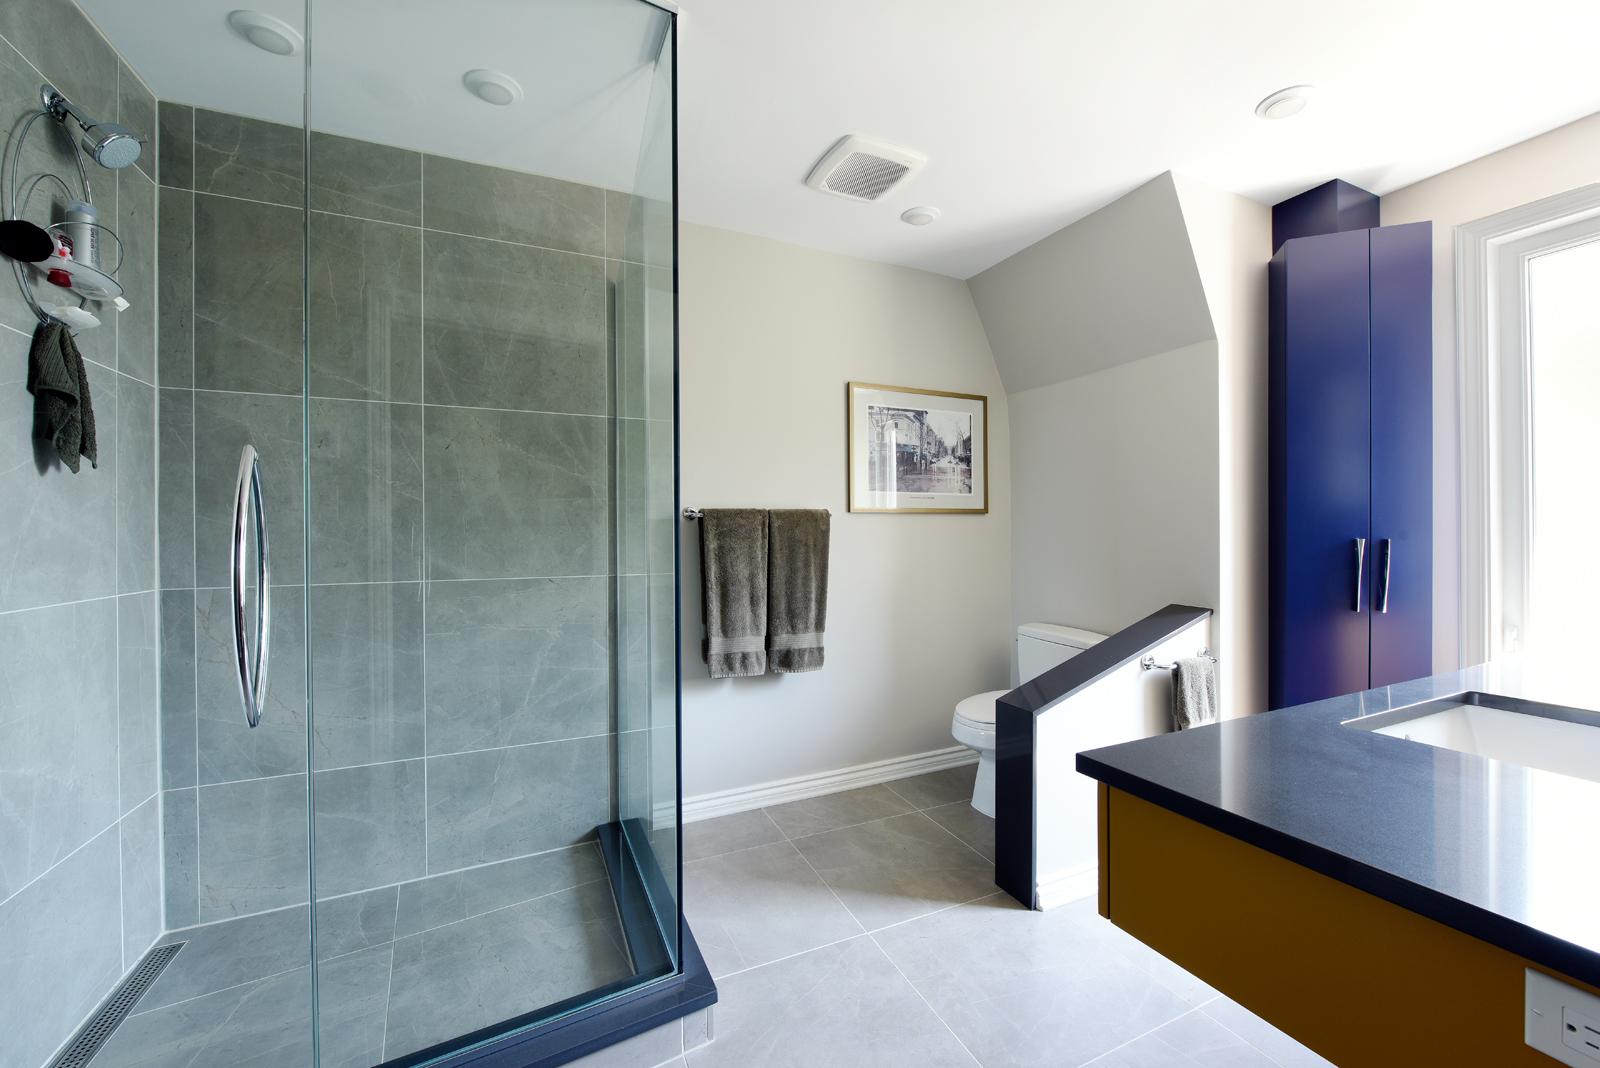 Janigan bath 1.jpg